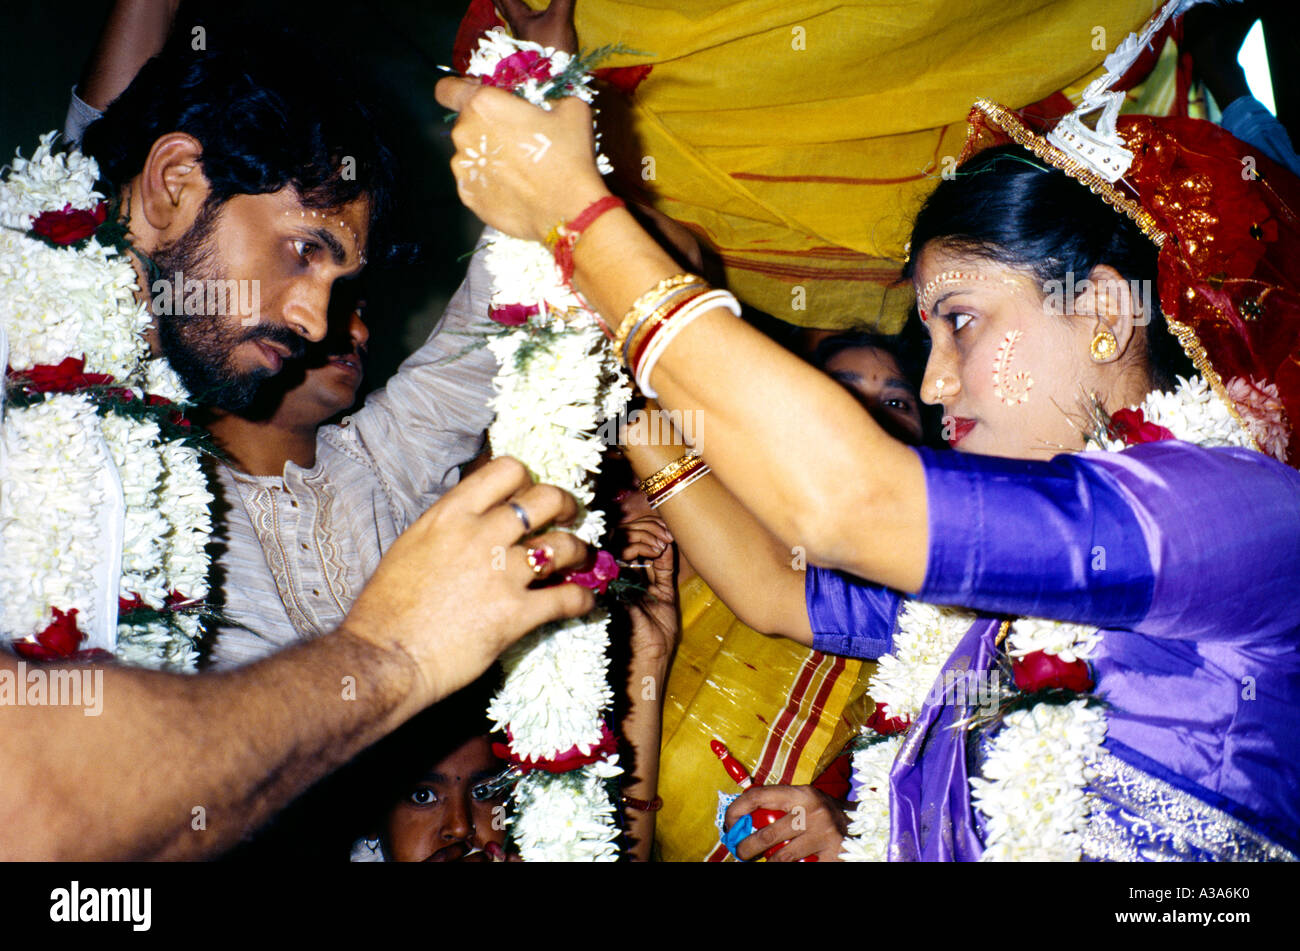 d94624d4fc67e Calcutta India Hindu Wedding Bride Stock Photos   Calcutta India ...